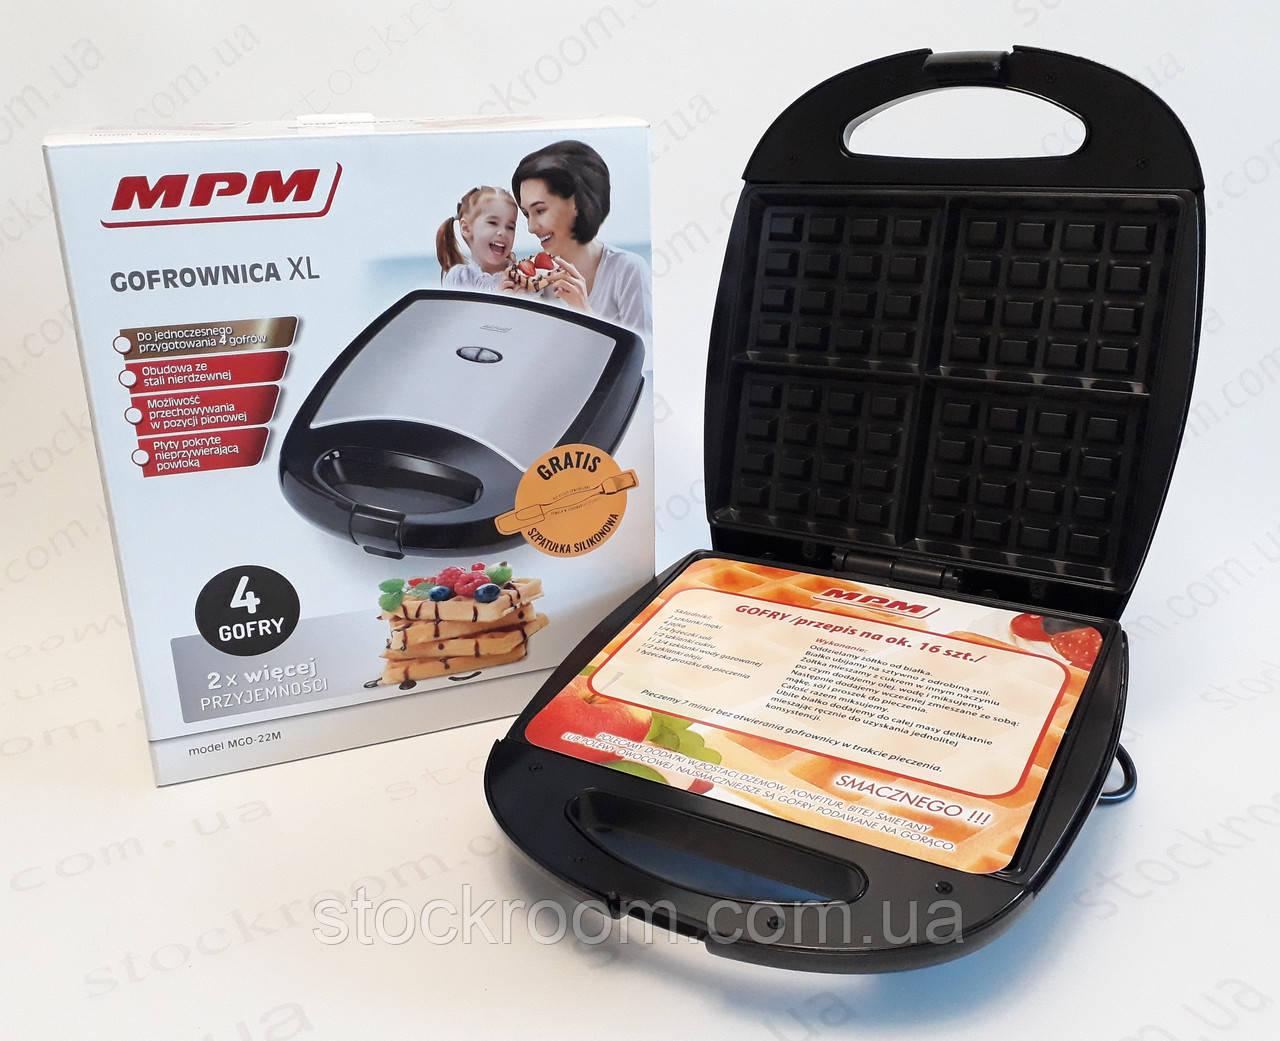 Вафельница MPM MGO-22M  мощностью 1300 Вт